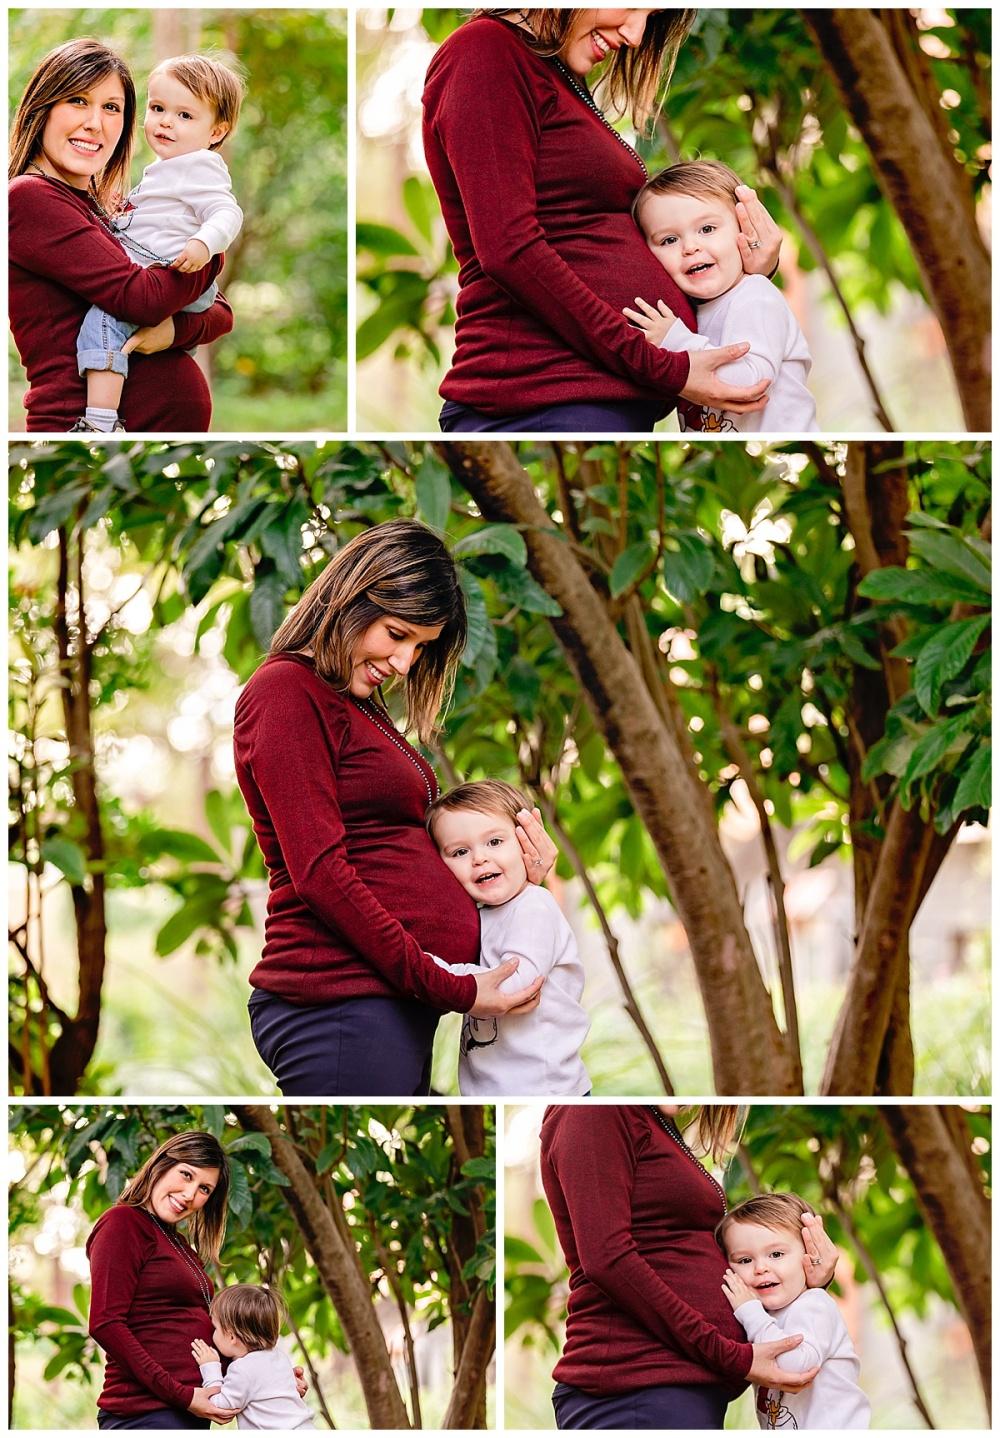 Family-Photographer-Gruene-Texas-Fall-Carly-Barton-Photography_0008.jpg